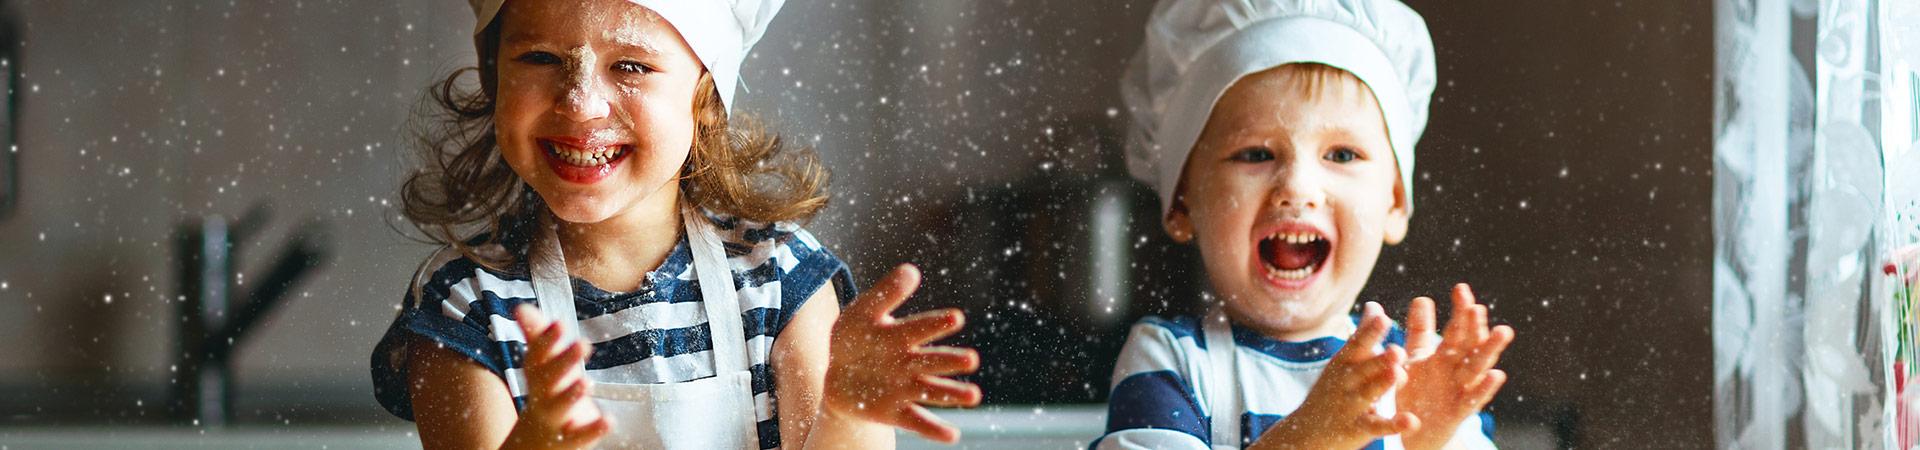 Happy Kids in the Kitchen